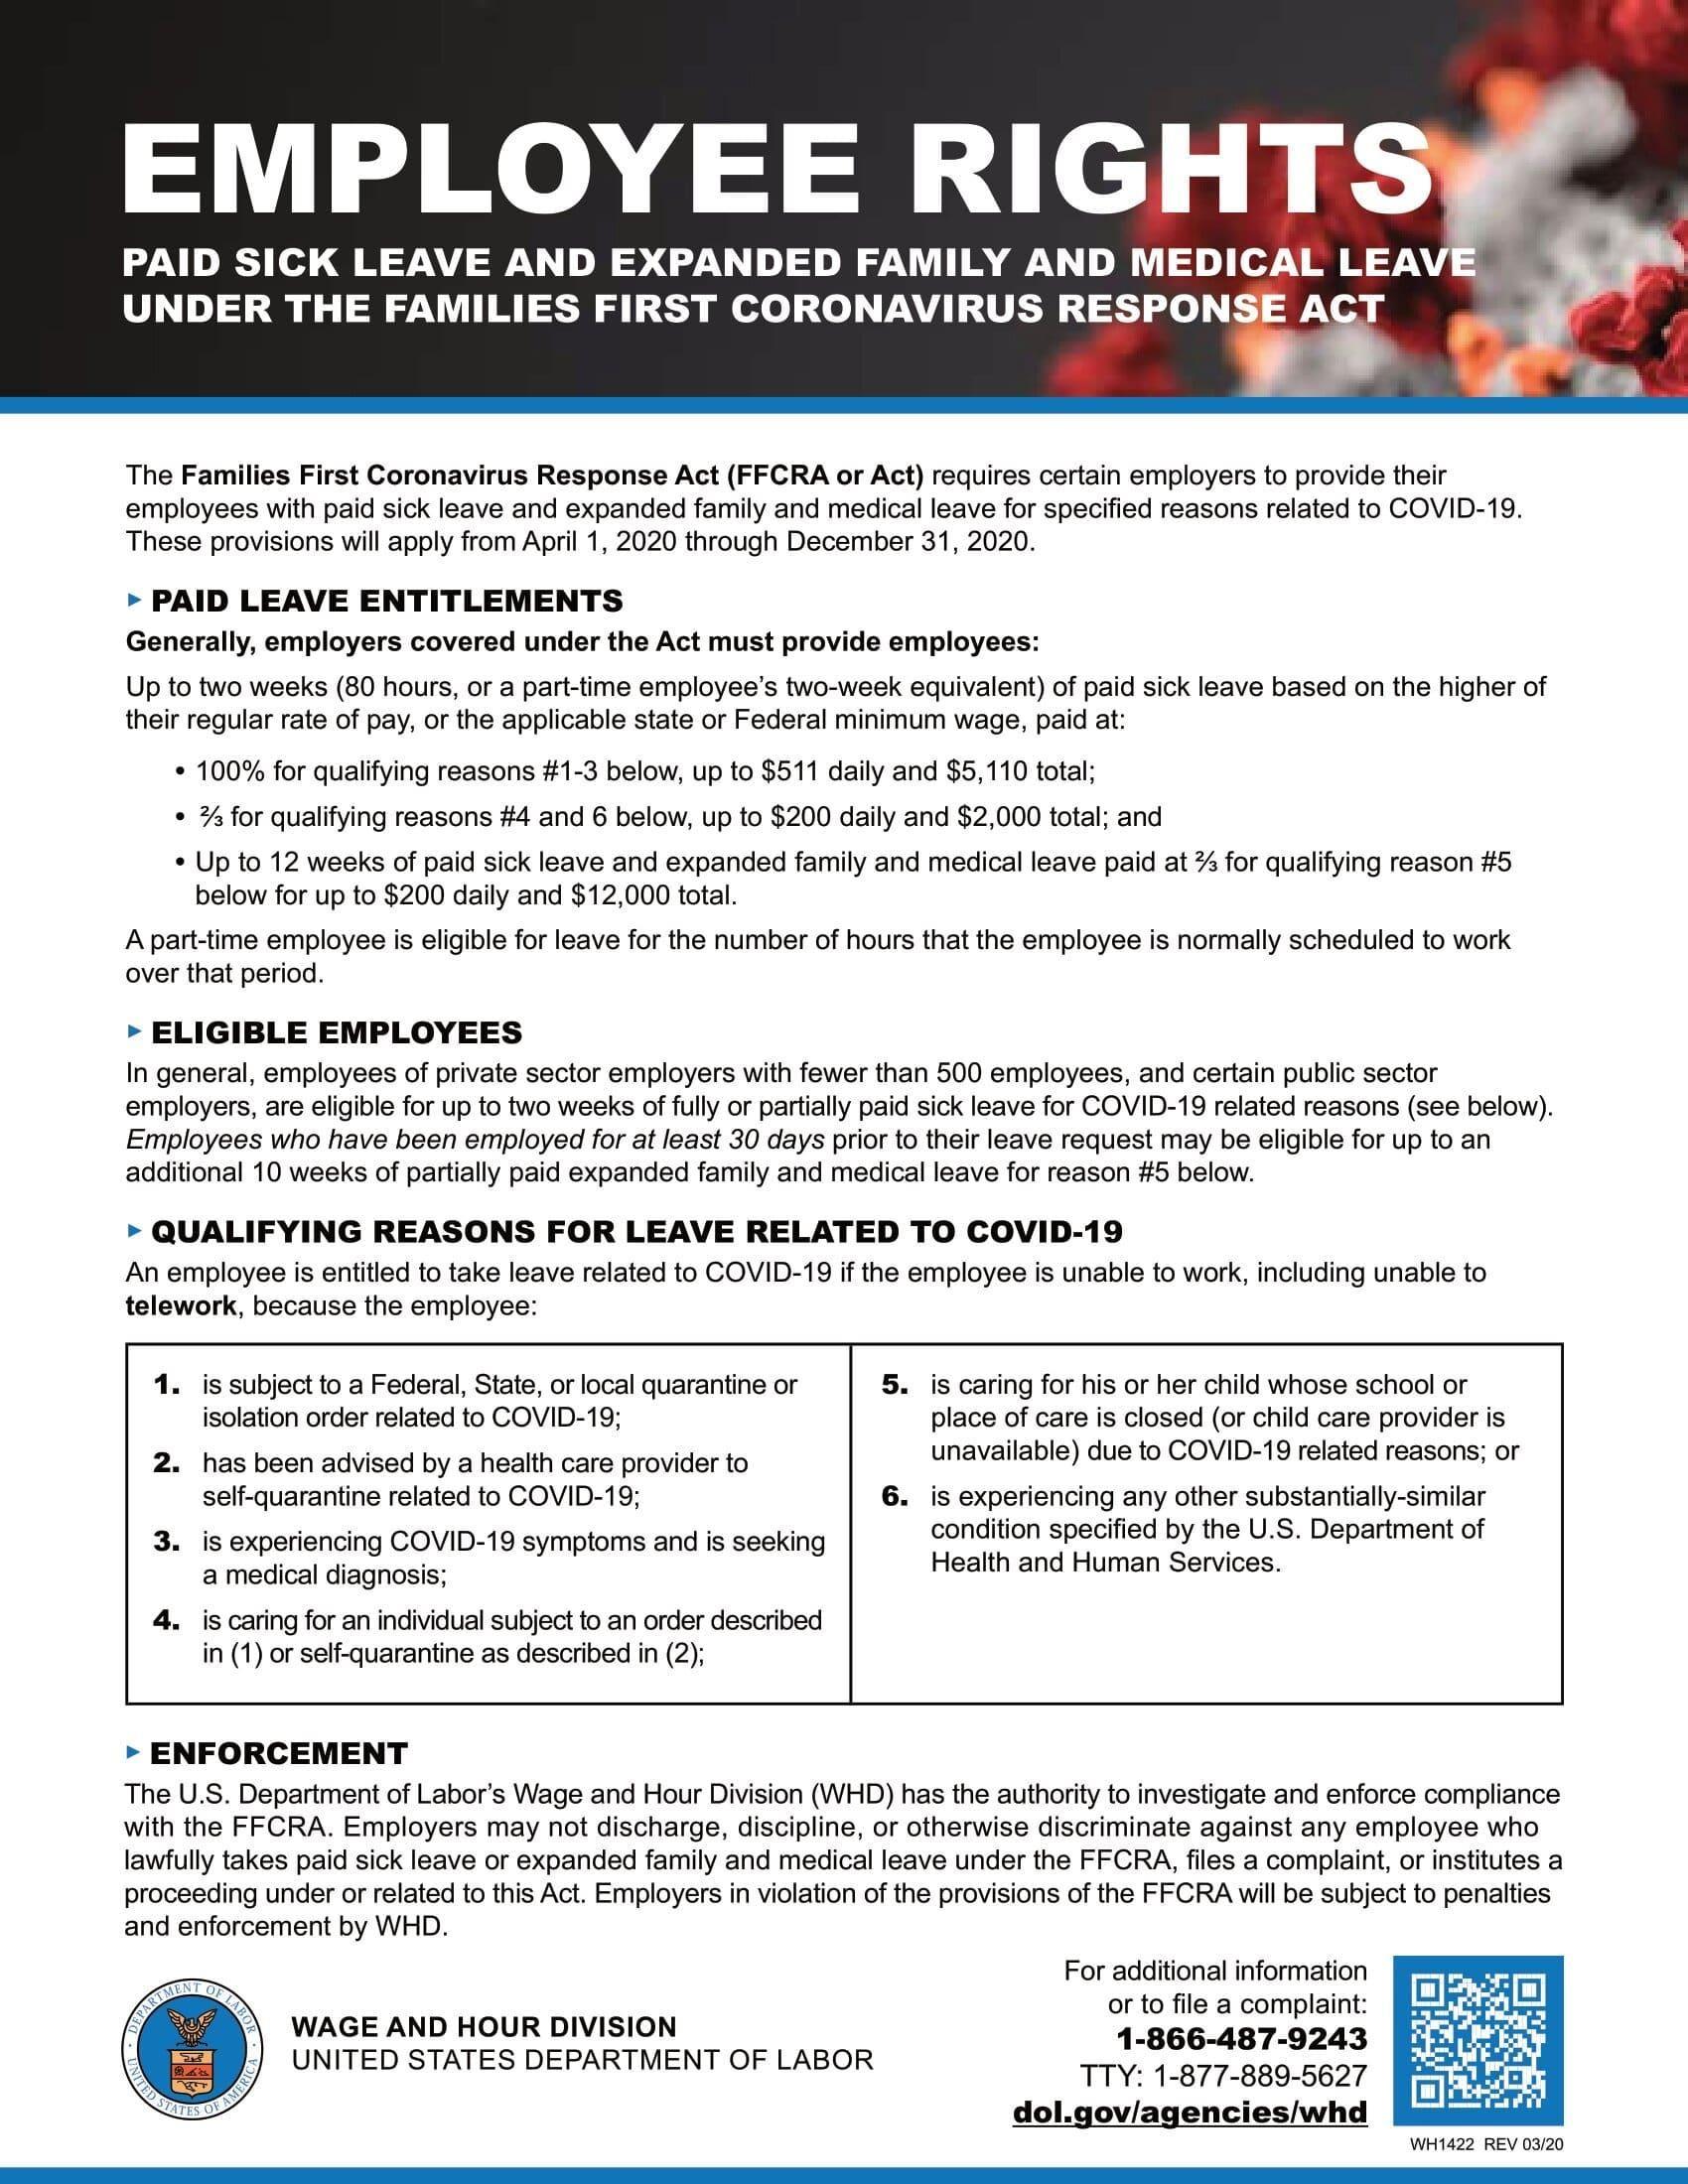 Employee Rights regarding COVID-19